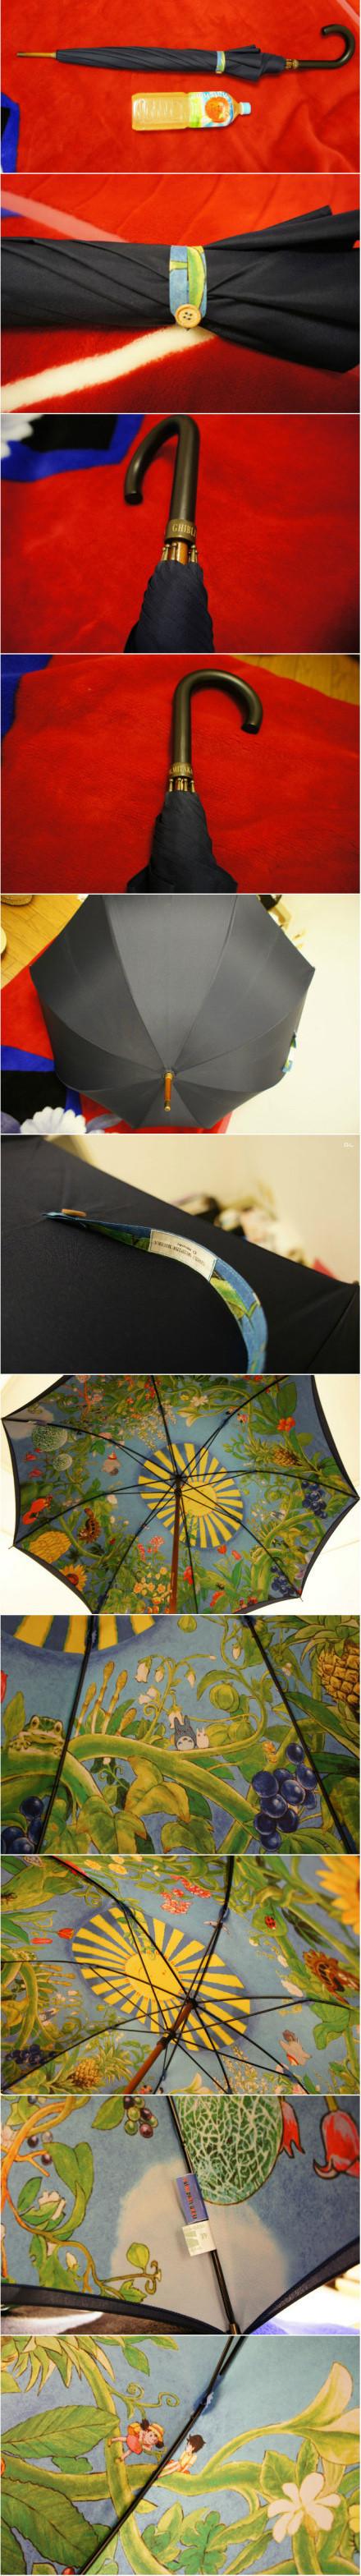 Black umbrella with #Totoro scenes inside. WANT it!